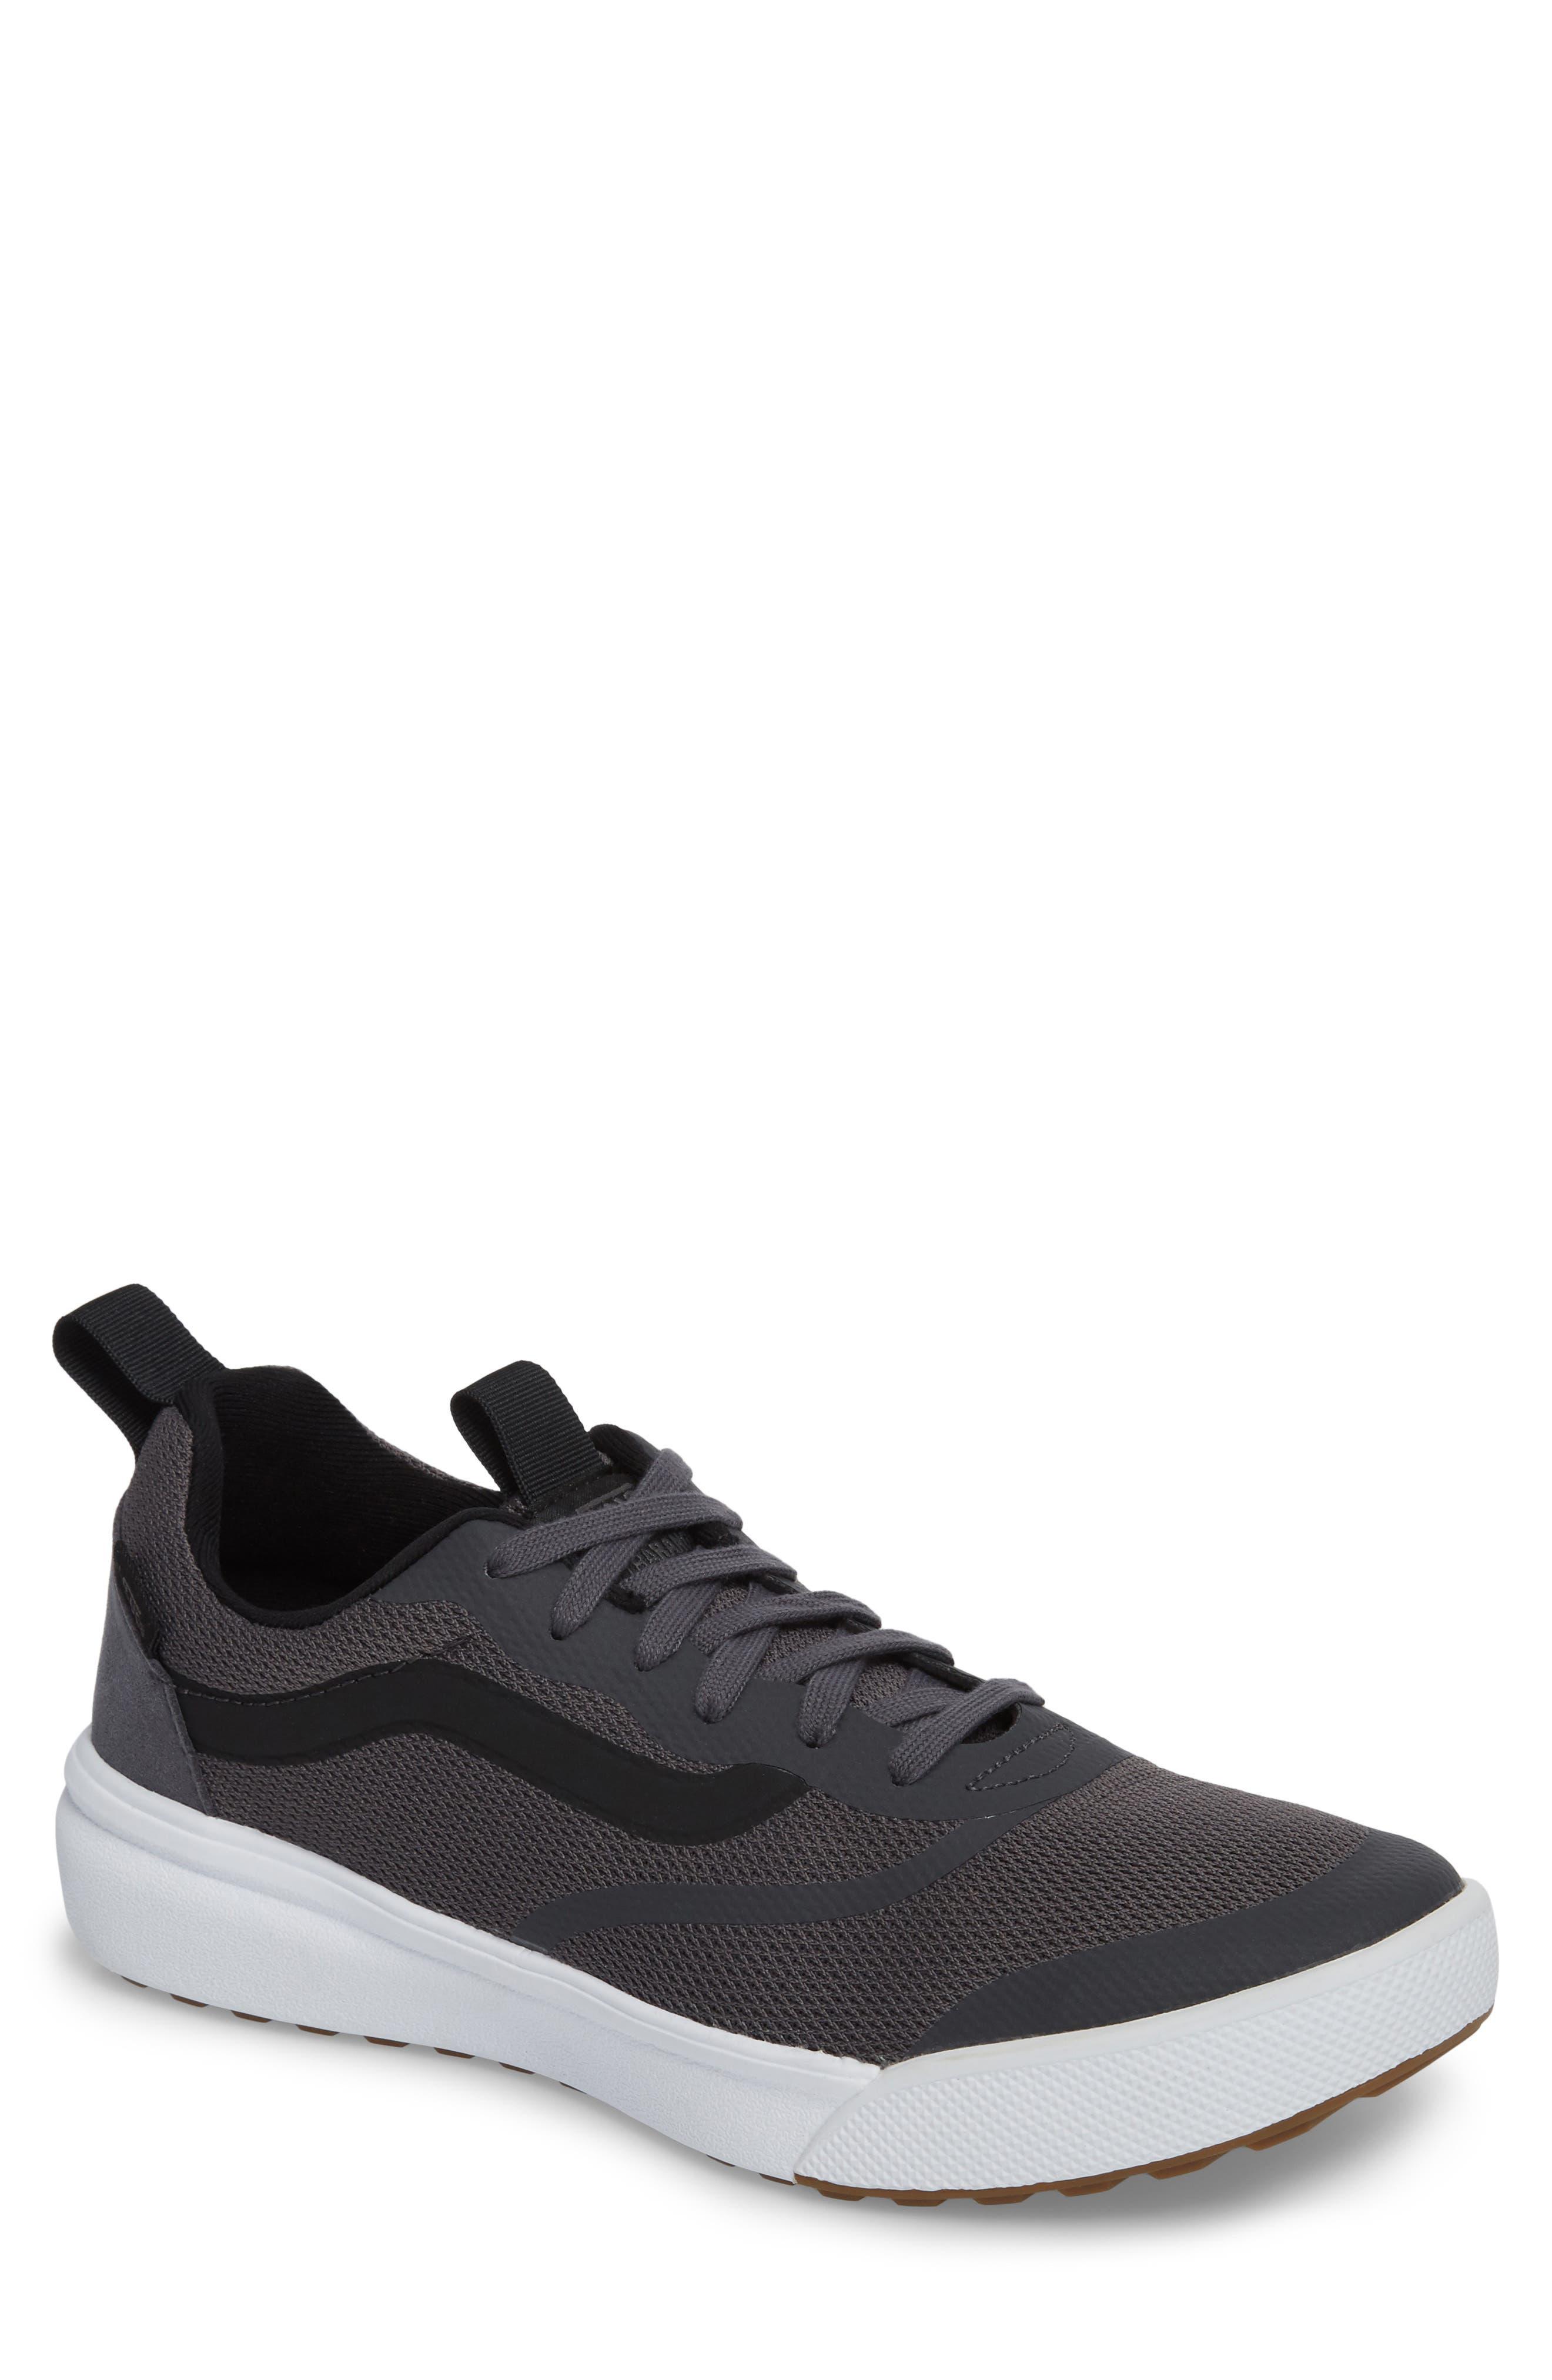 Vans Ultrarange Rapidwield Sneaker (Men)